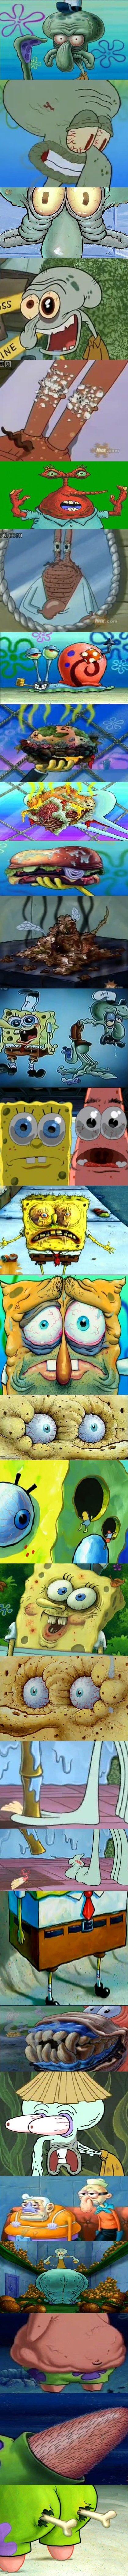 Morbid Spongebob Comp. Assembled by Welfarekid (me :3).. spongebob is for kids >.> suck a nigga Dick or something